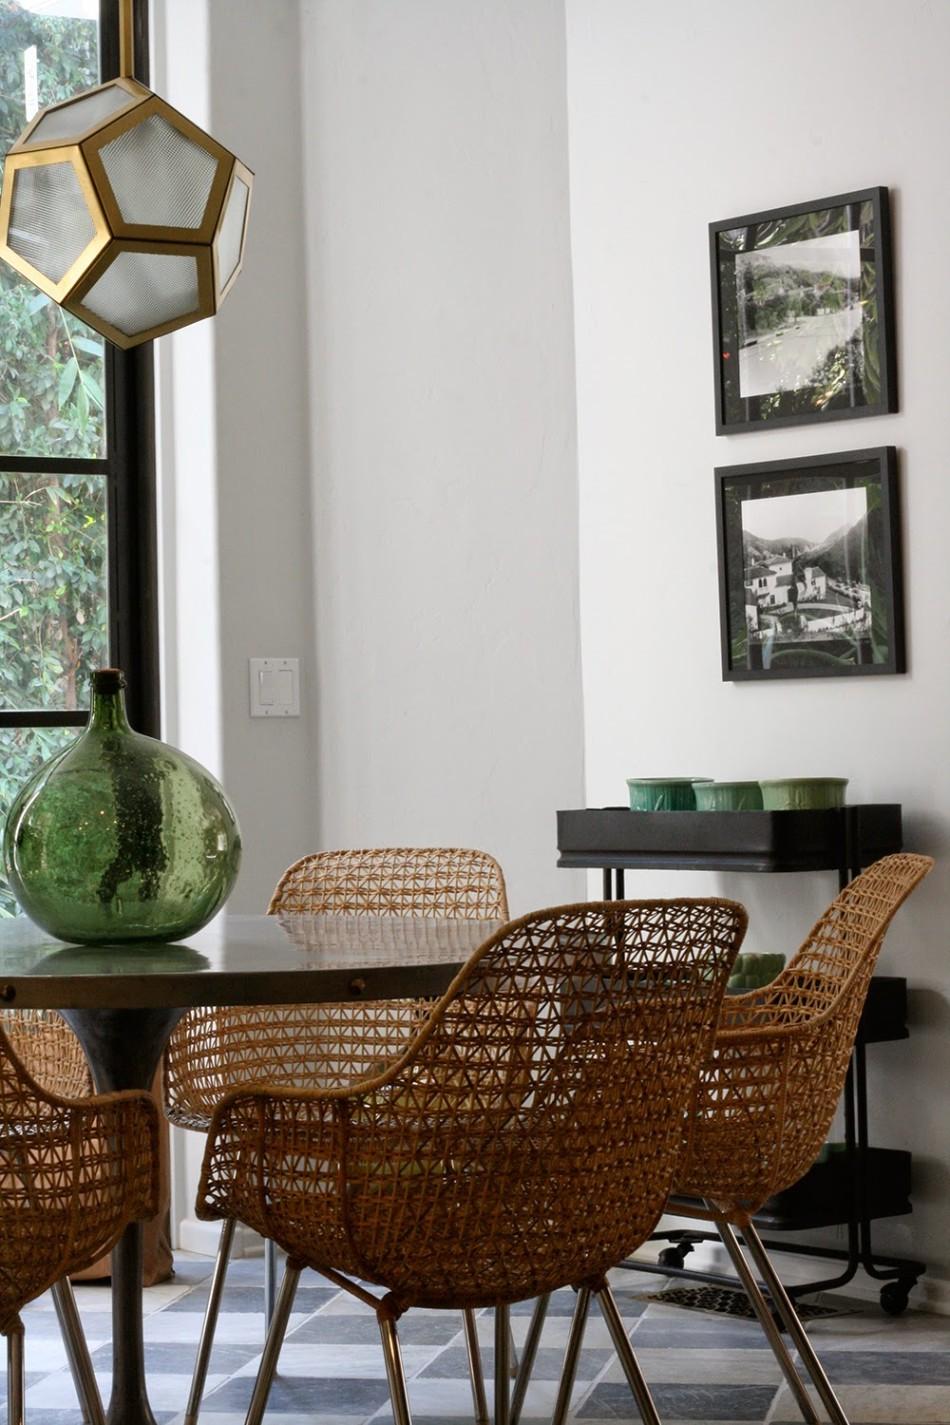 Berkus's Beautiful Dining Room Ideas | www.bocadolobo.com #diningtables #moderndiningtables #diningroom #moderndiningroom #interiordesign #interiordesigners #topinteriordesigners #nateberkus @moderndiningtables